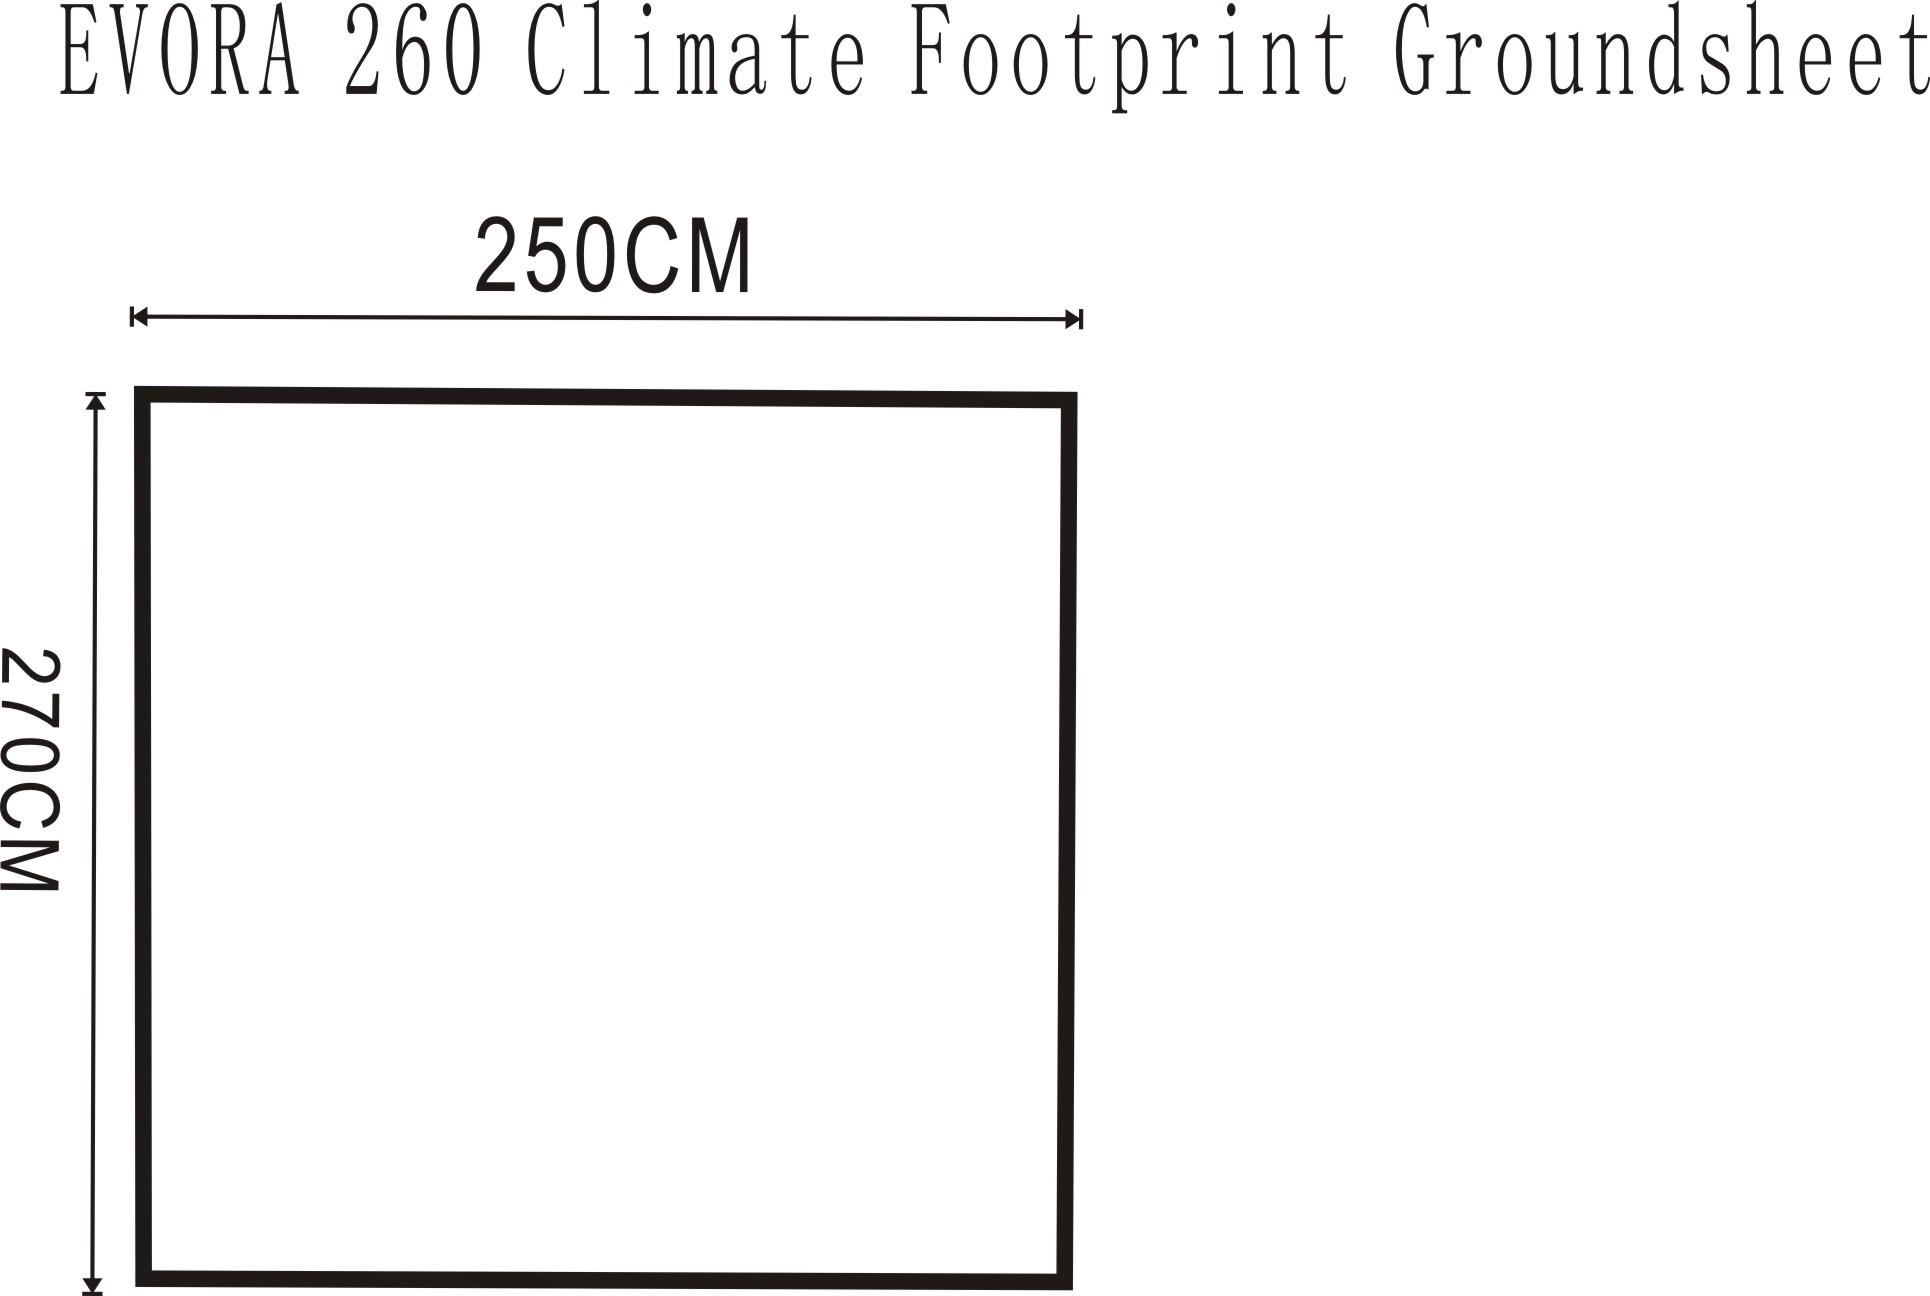 Outdoor Revolution Evora 260 Pro Climate Footprint